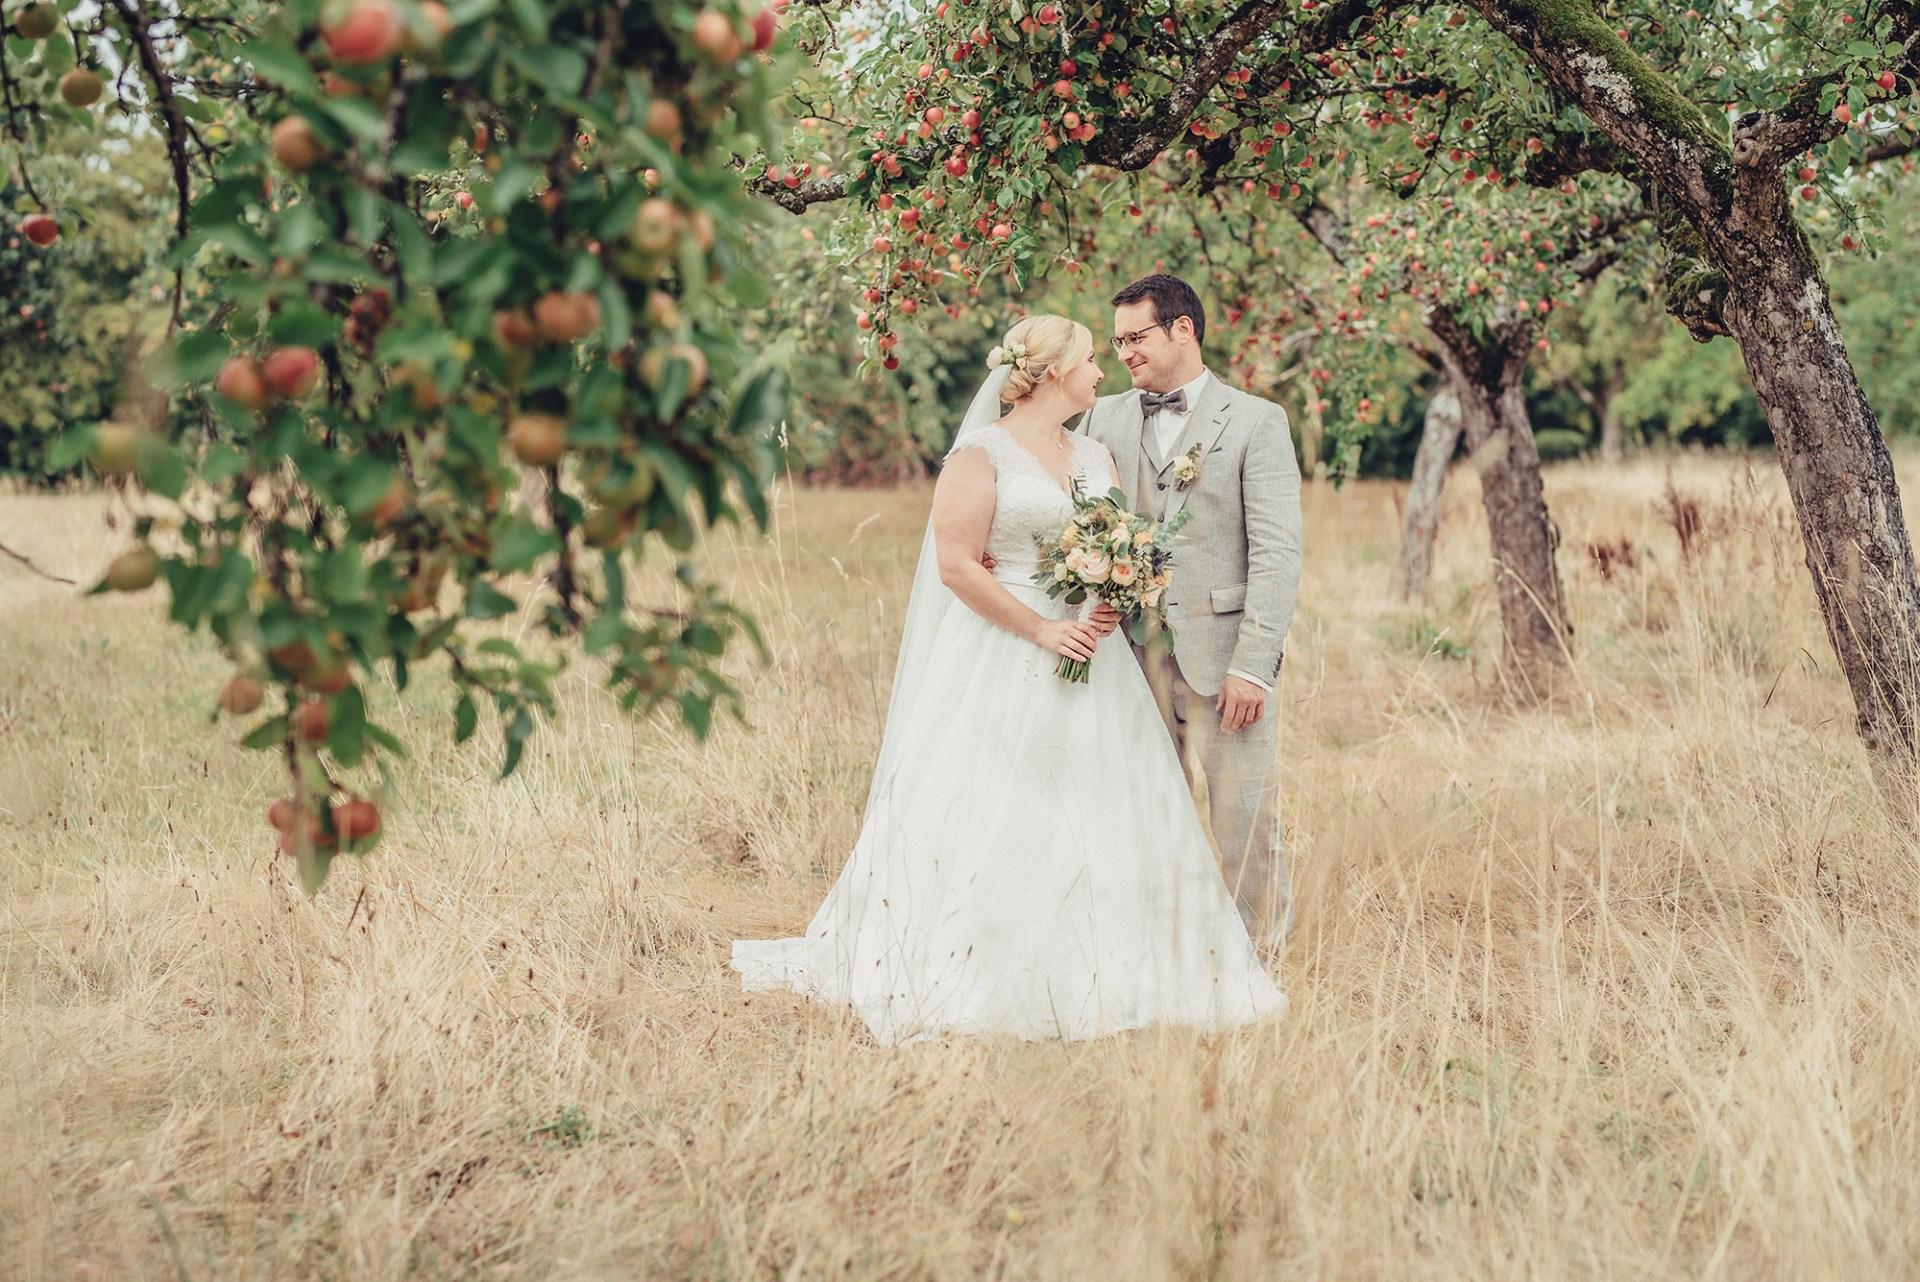 weddingseptemberluminoxx92348234156